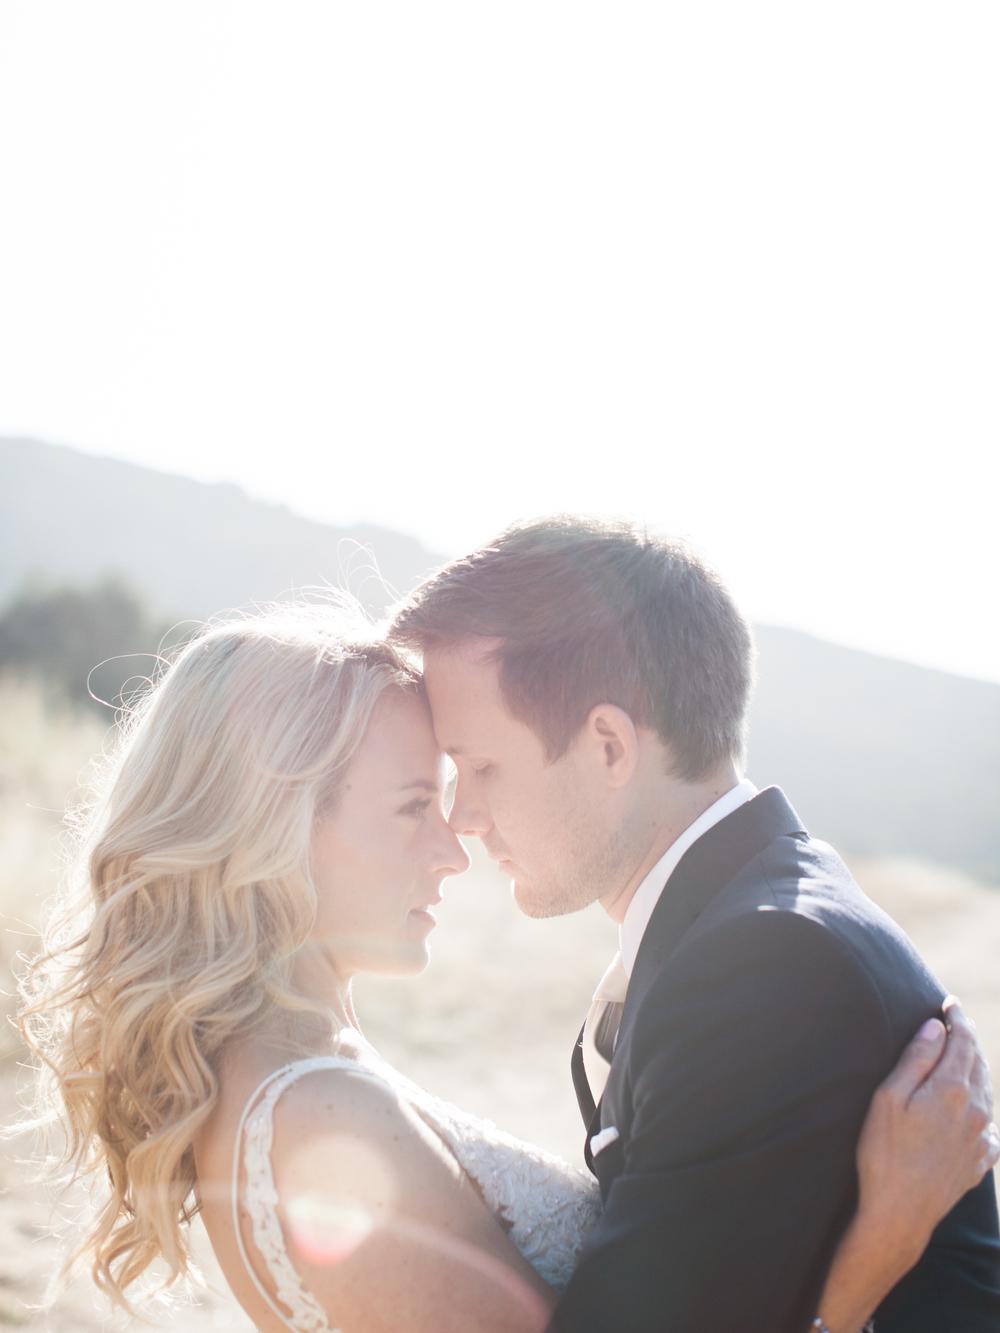 Santa Barbara Wedding Photographer Skyla Walton (1 of 1)-3.jpg